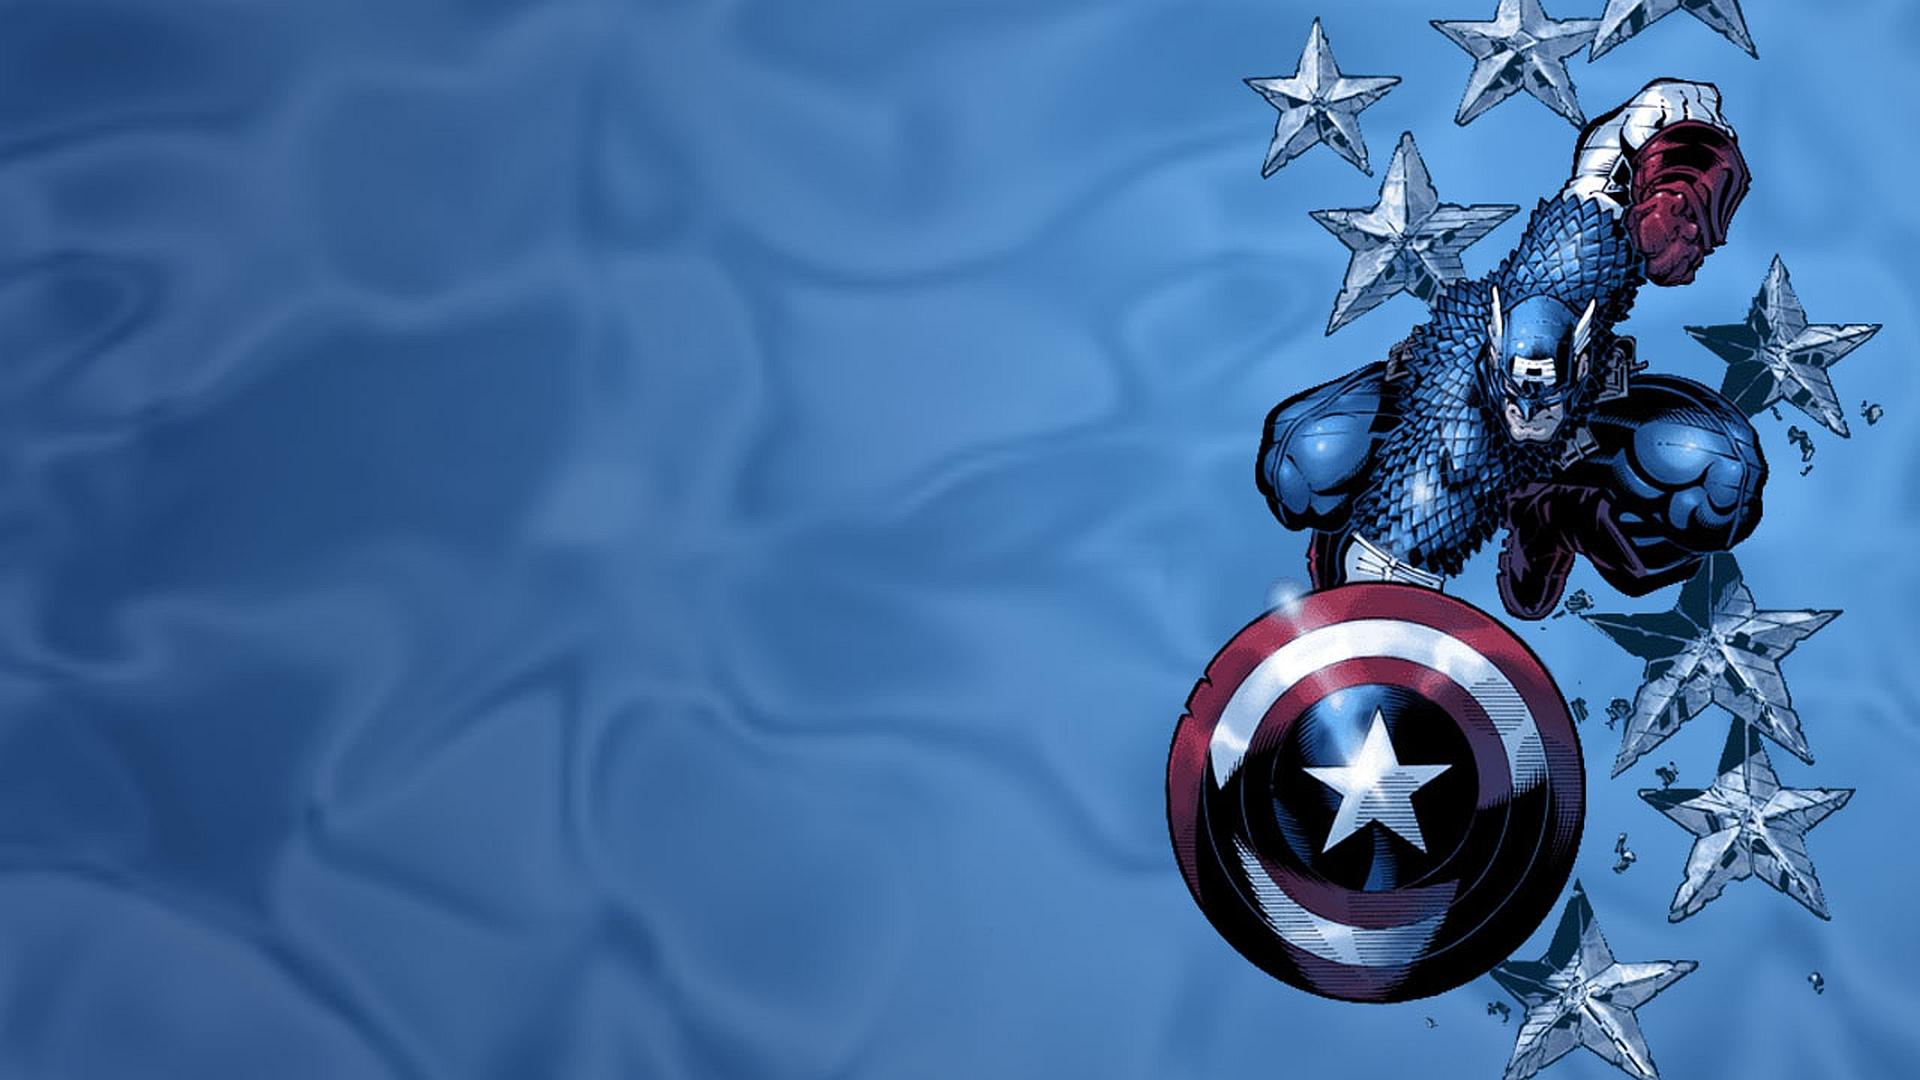 Wallpaper Abyss Explore the Collection Captain America Comics Captain 1920x1080